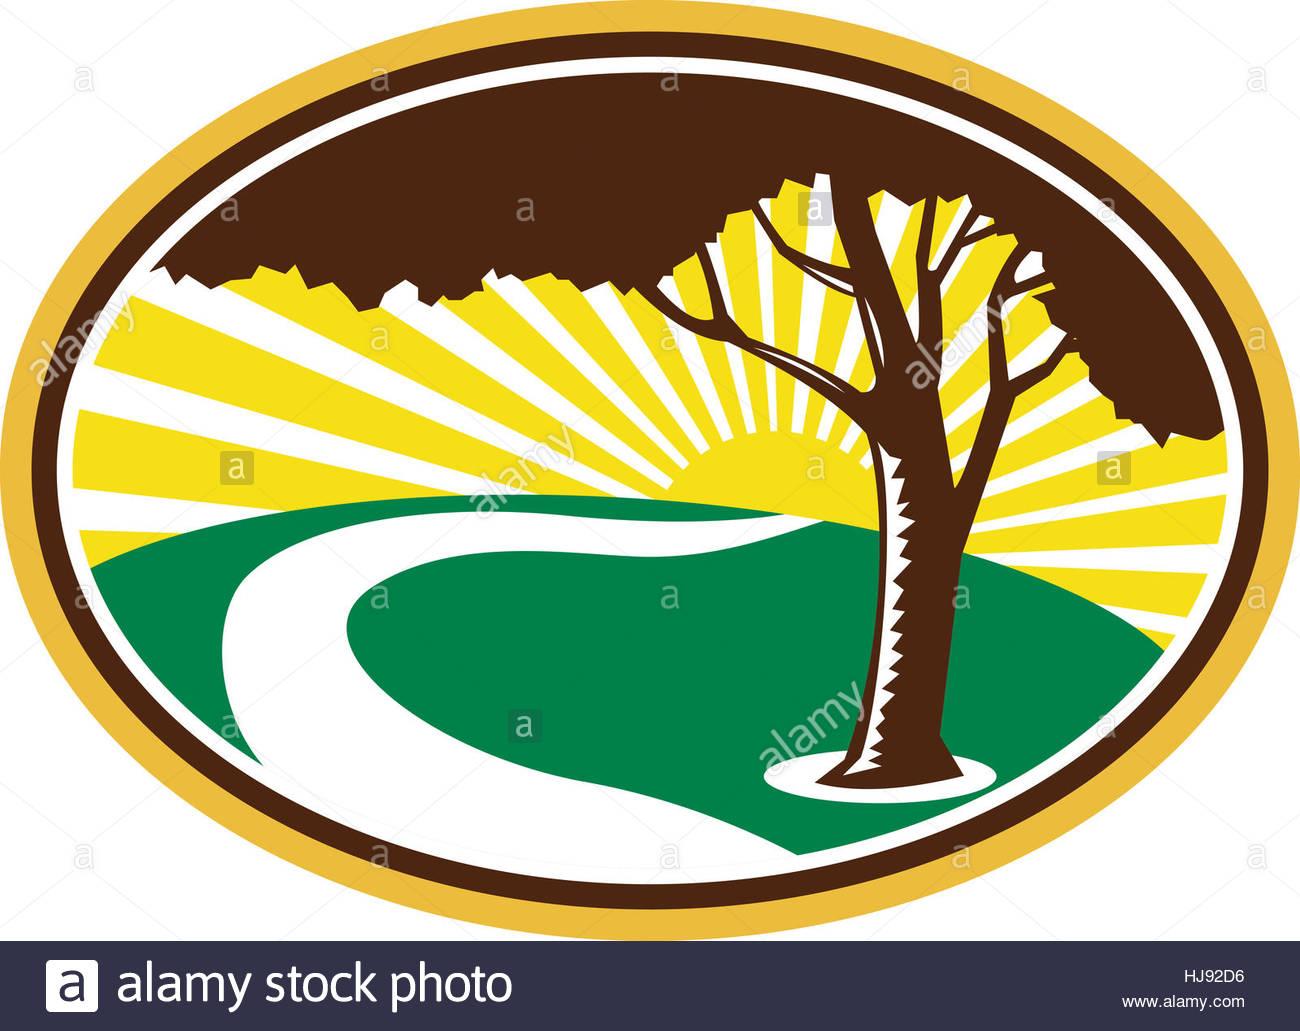 Graphics, Tree, Field, Stream, Illustration, Farm, Retro, Orchard.